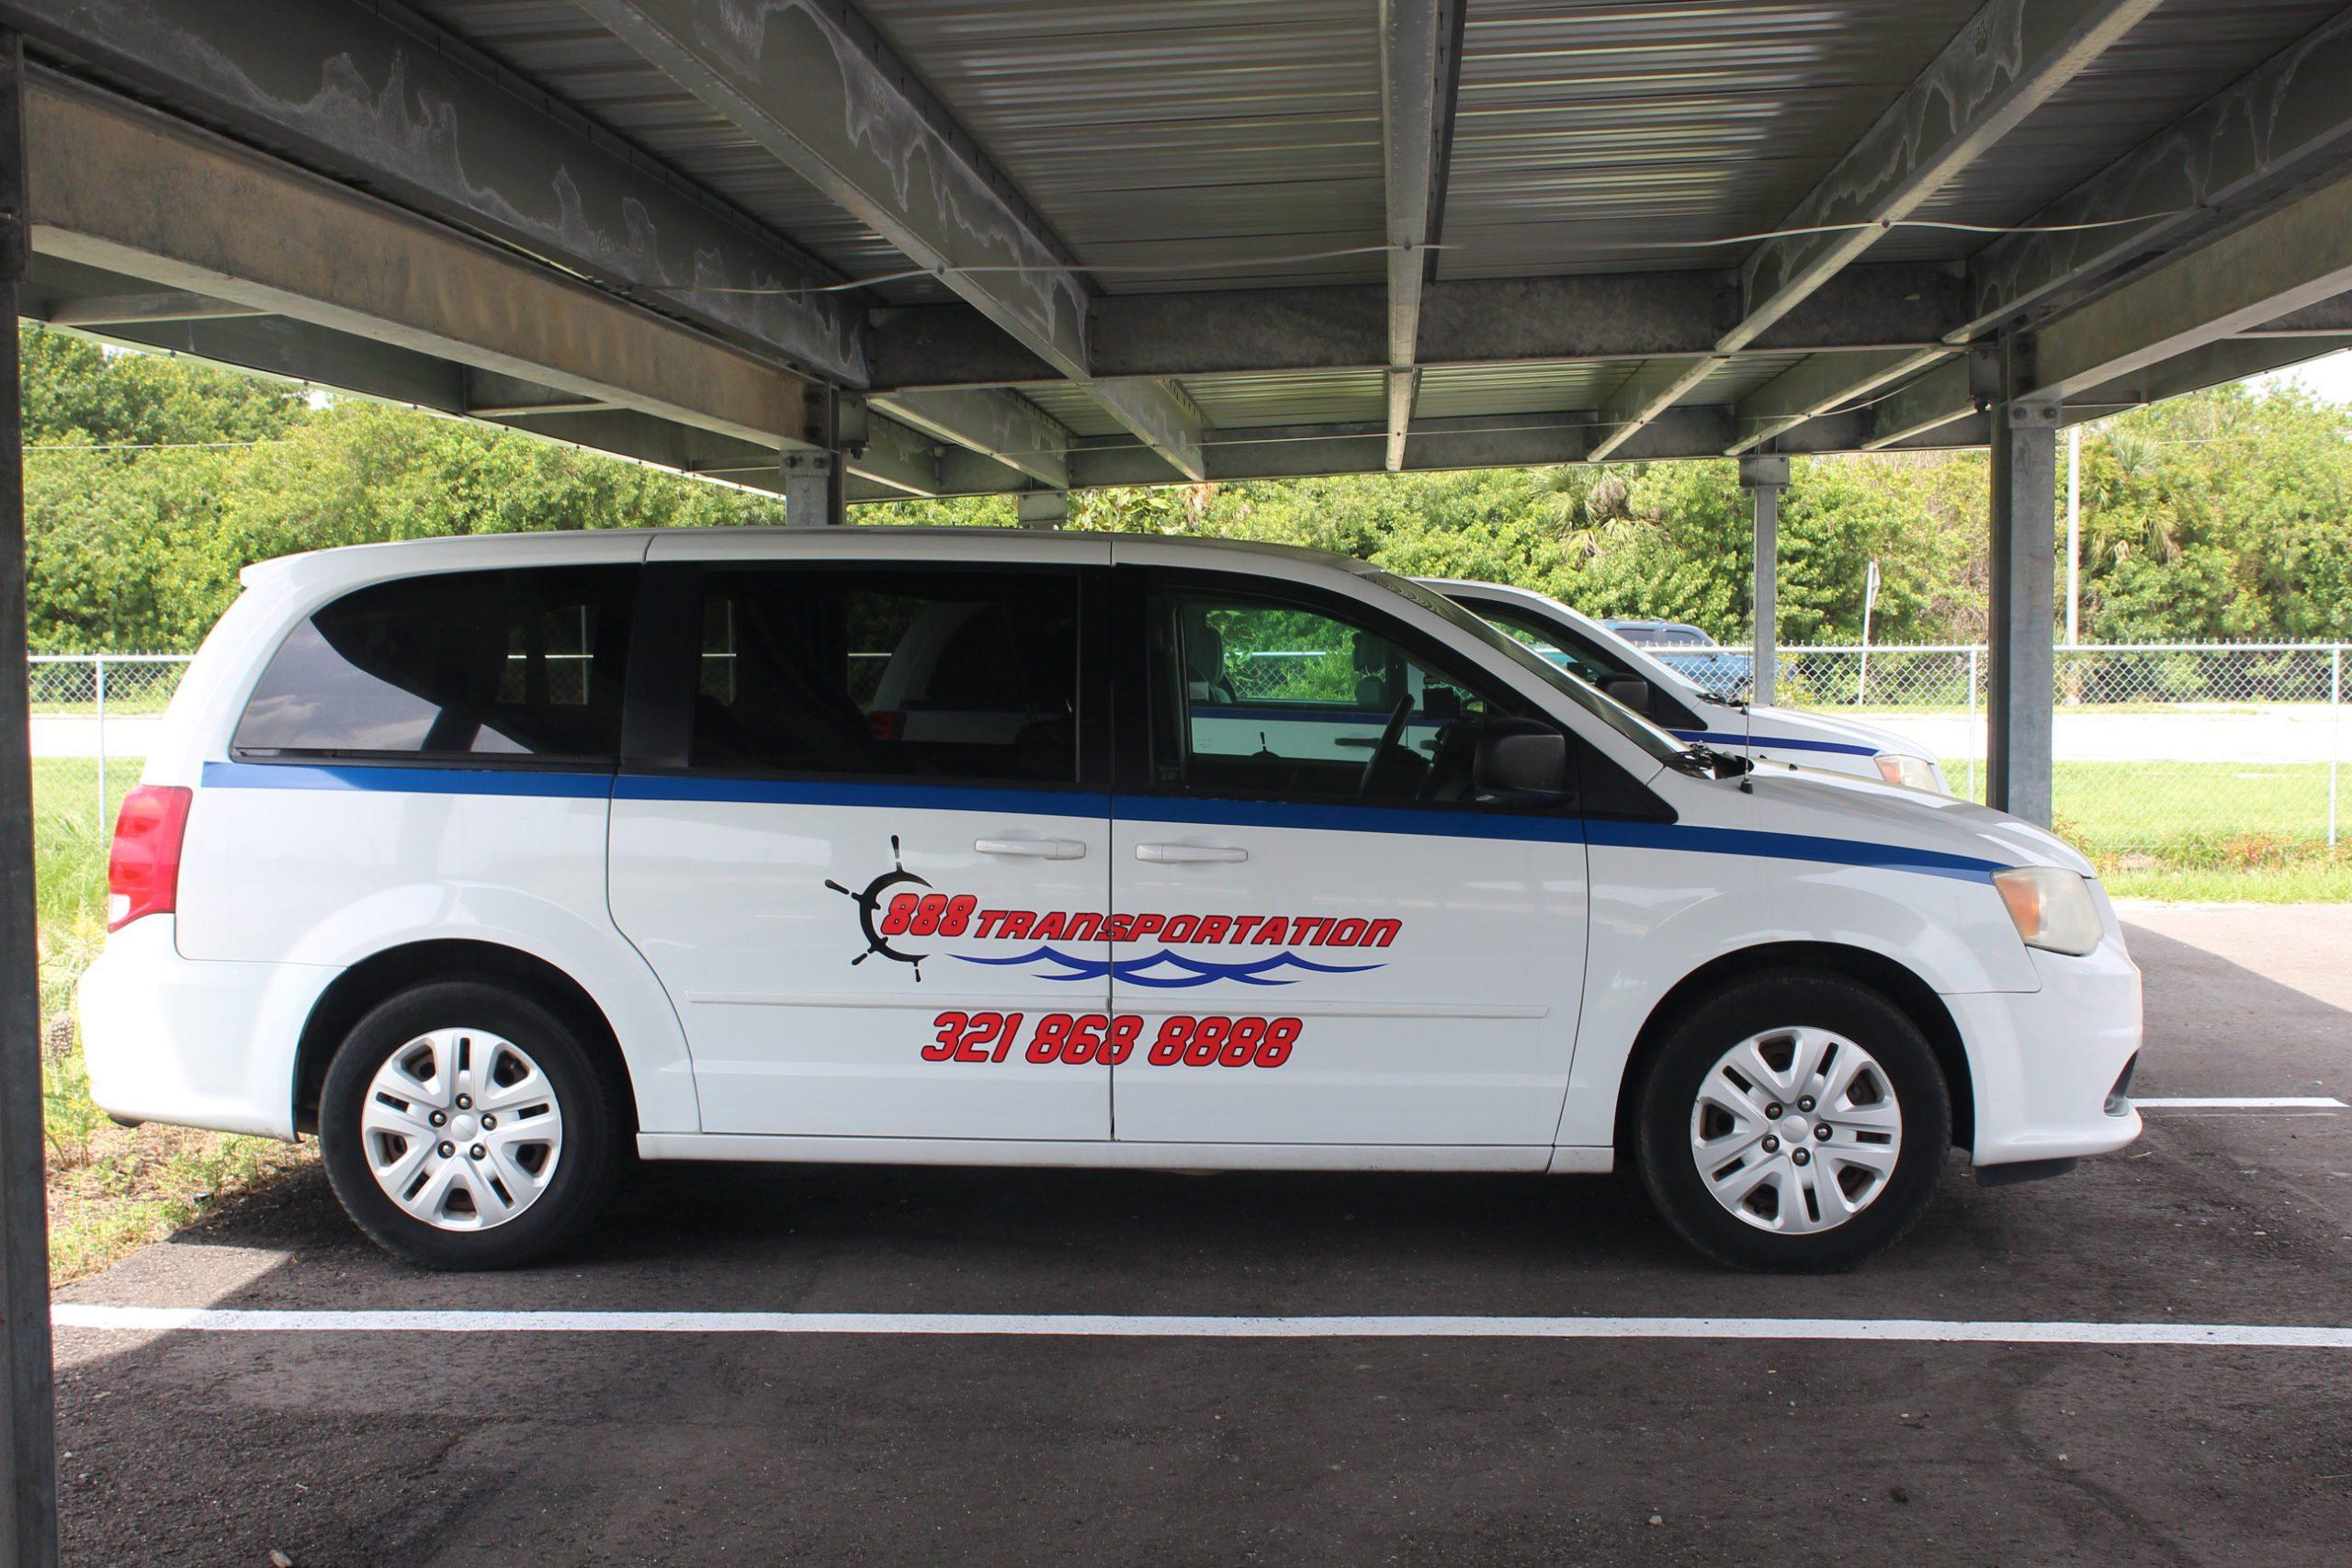 888 transportation taxis